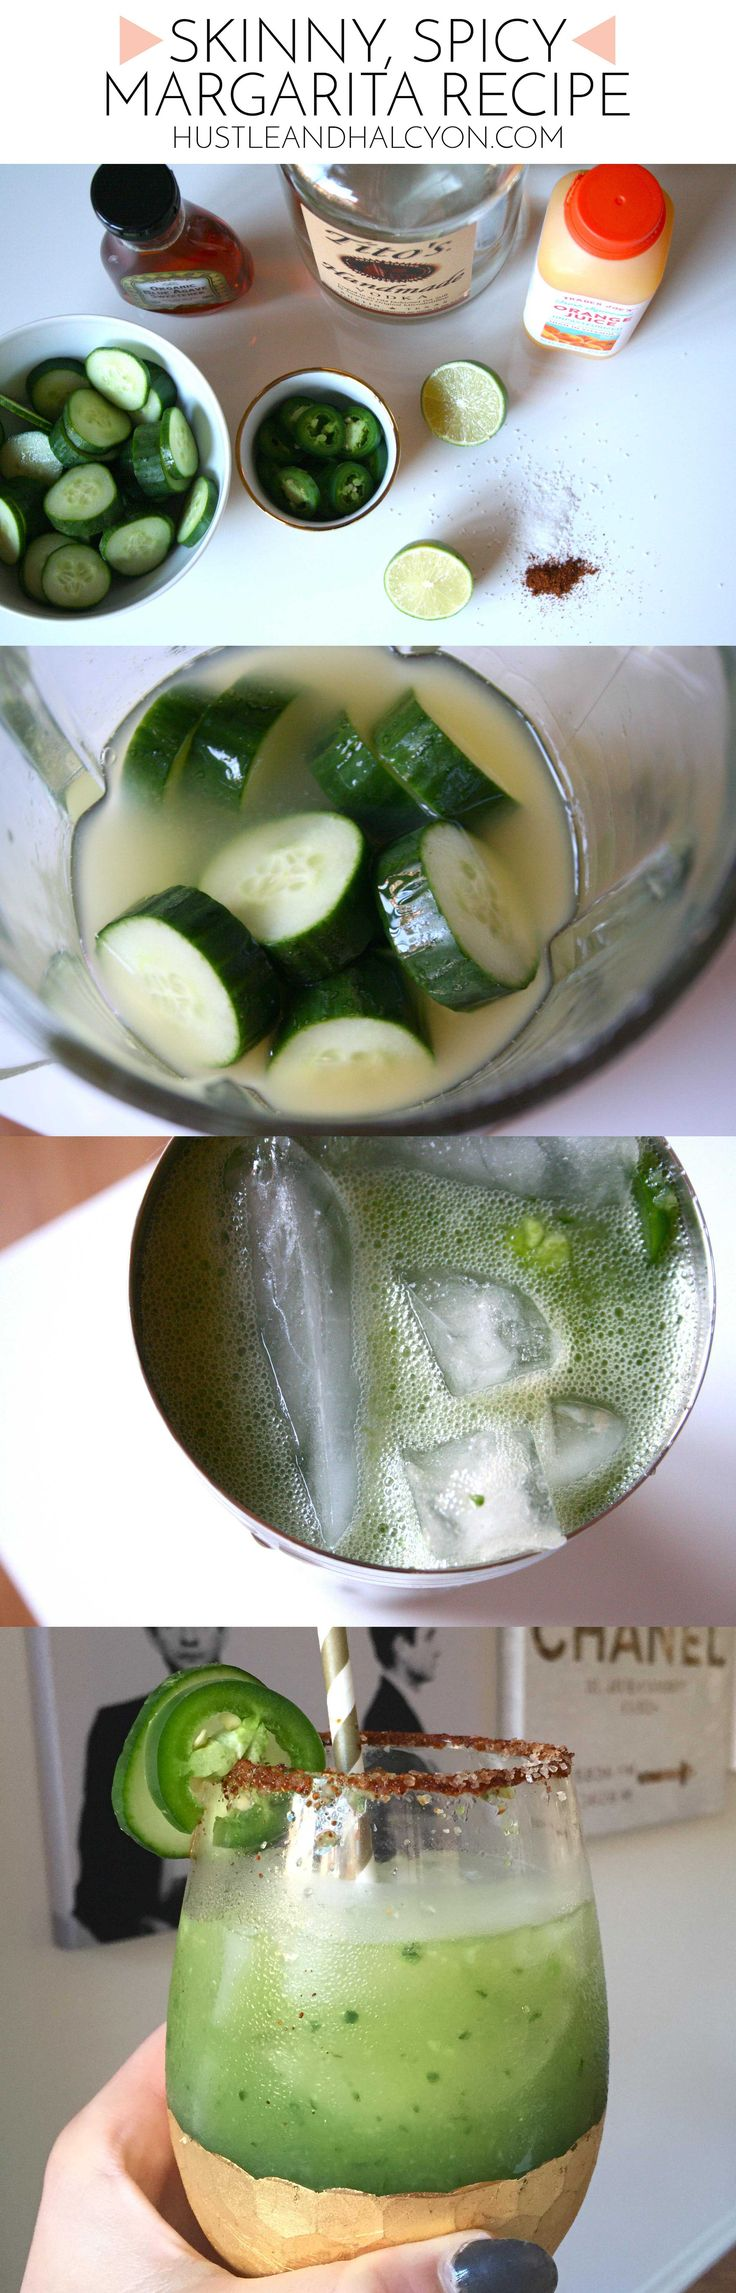 Skinny, Spicy Margarita Recipe | www.HustleAndHalcyon.com